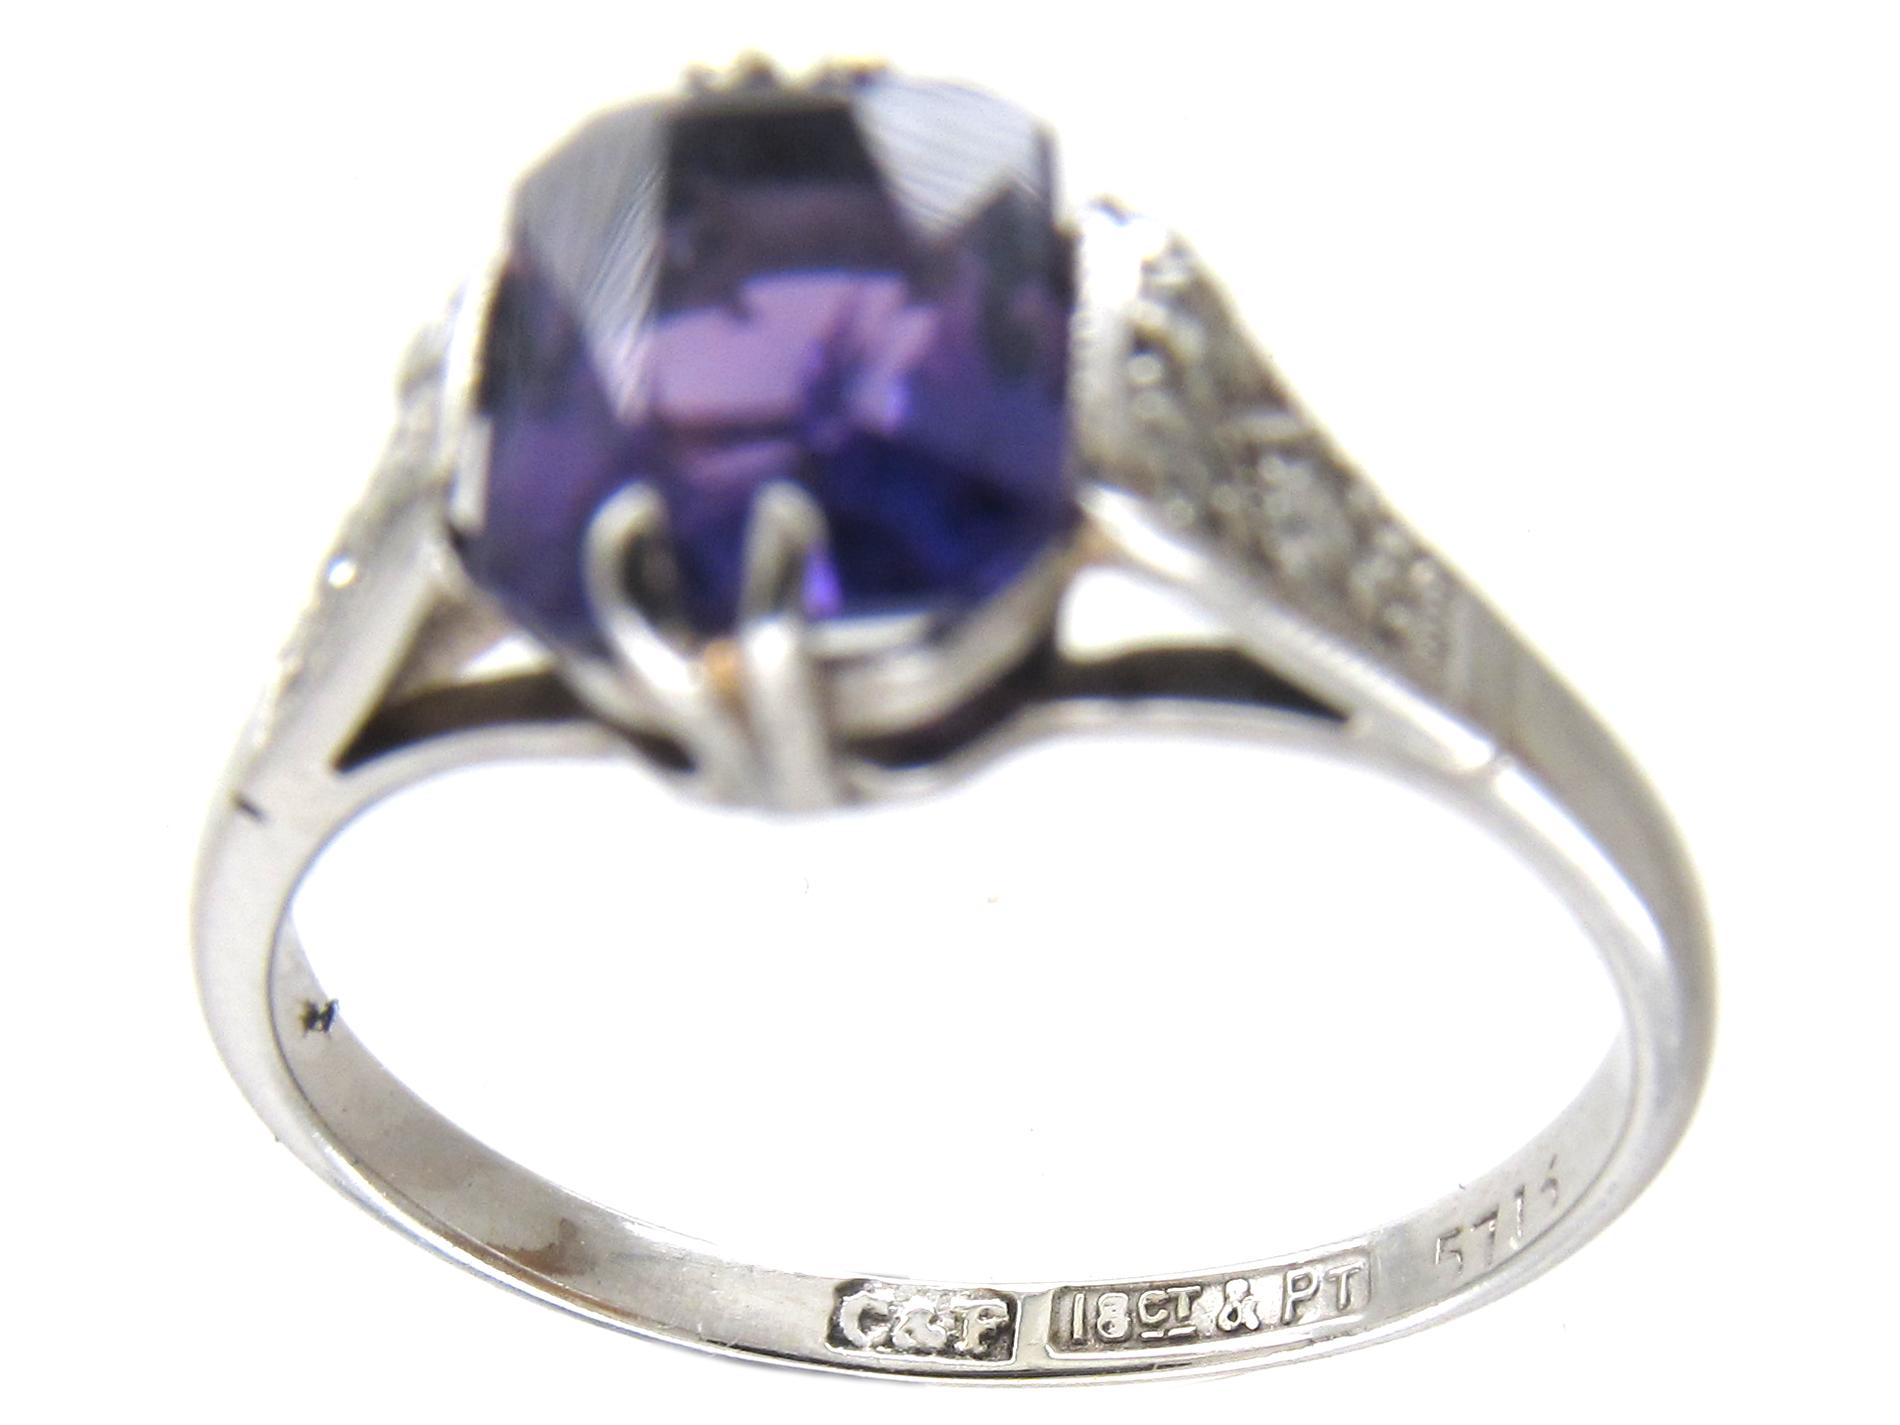 18ct & Platinum Art Deco Amethyst & Diamond Ring